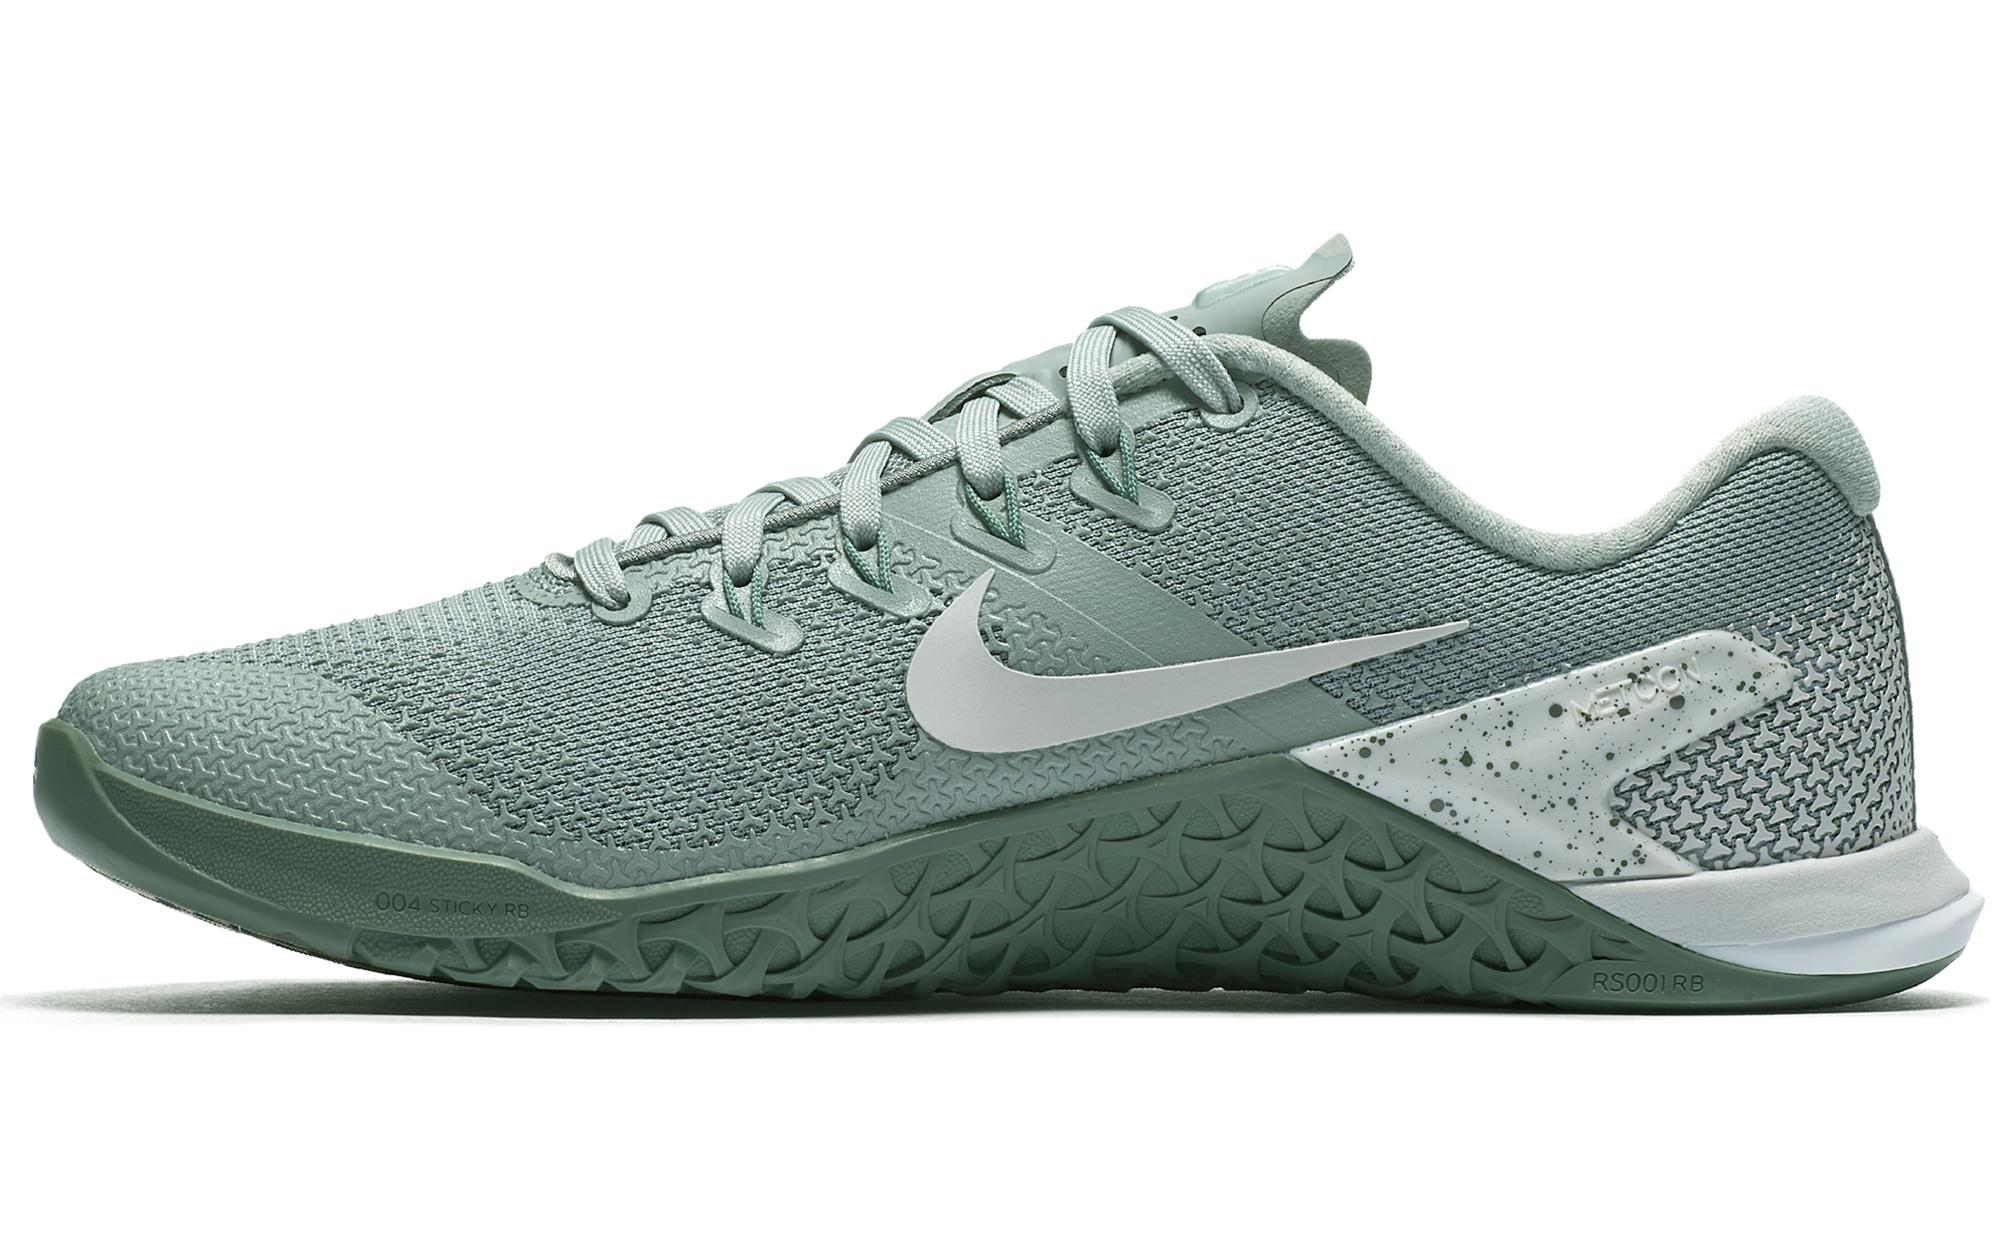 Nike Metcon 4 side